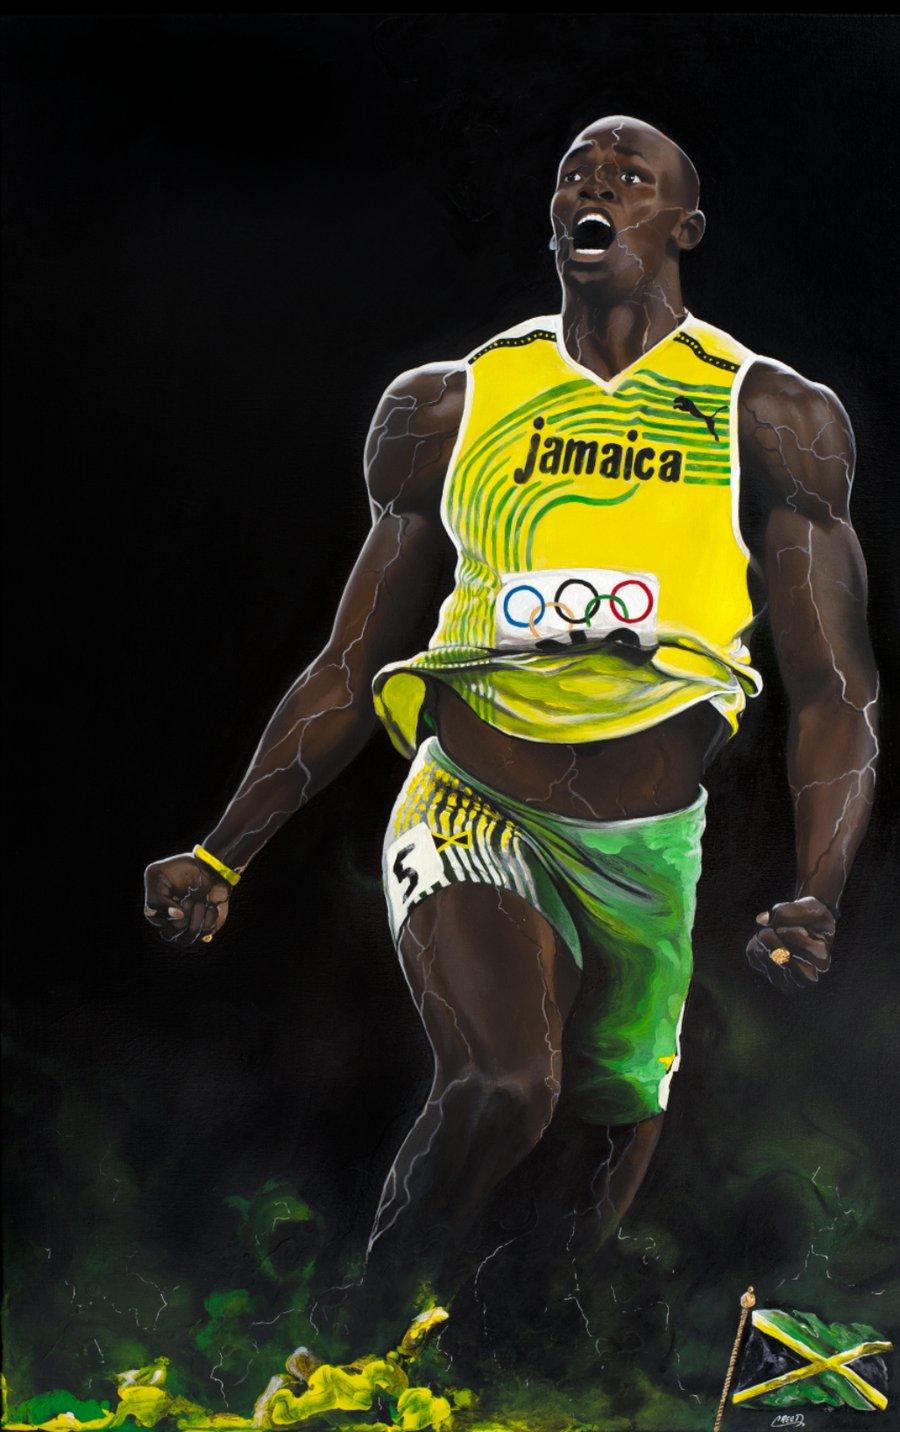 Image of Usain Bolt